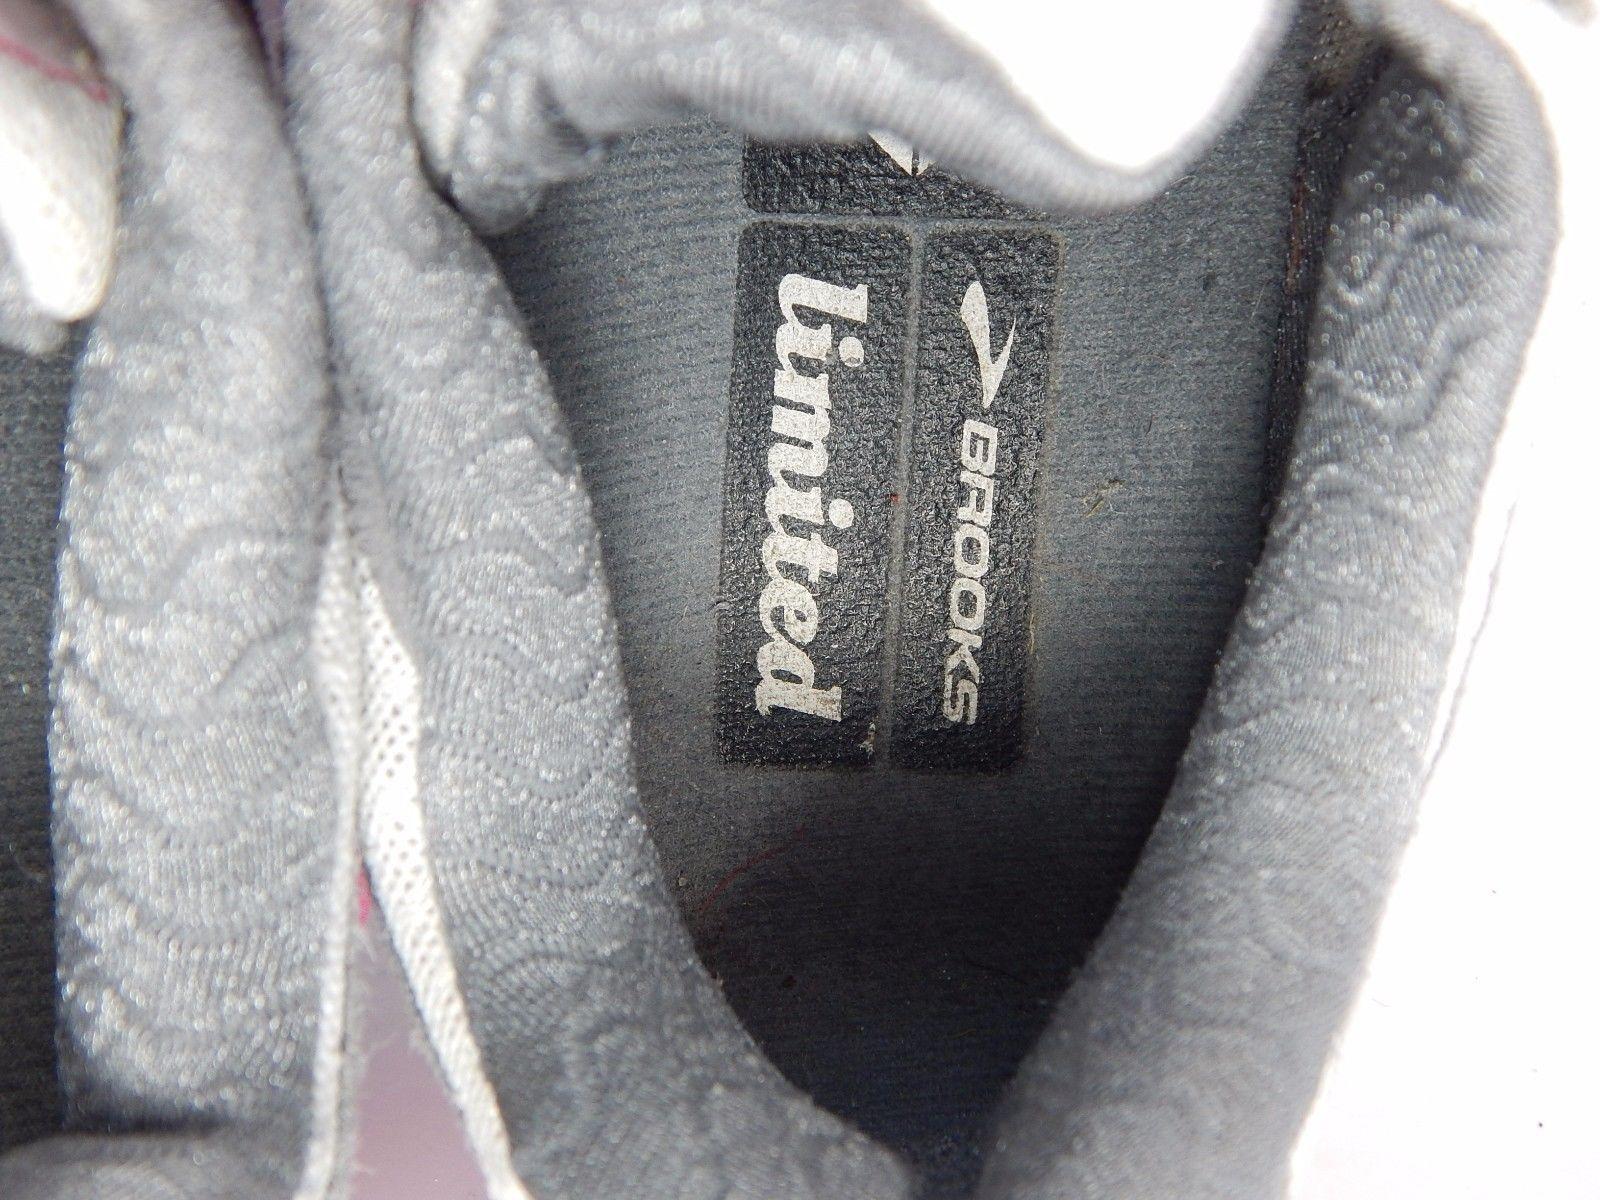 Brooks Pure Cadence 2 Women's Running Shoes Size US 7 M (B) EU 38 PureCadence 2